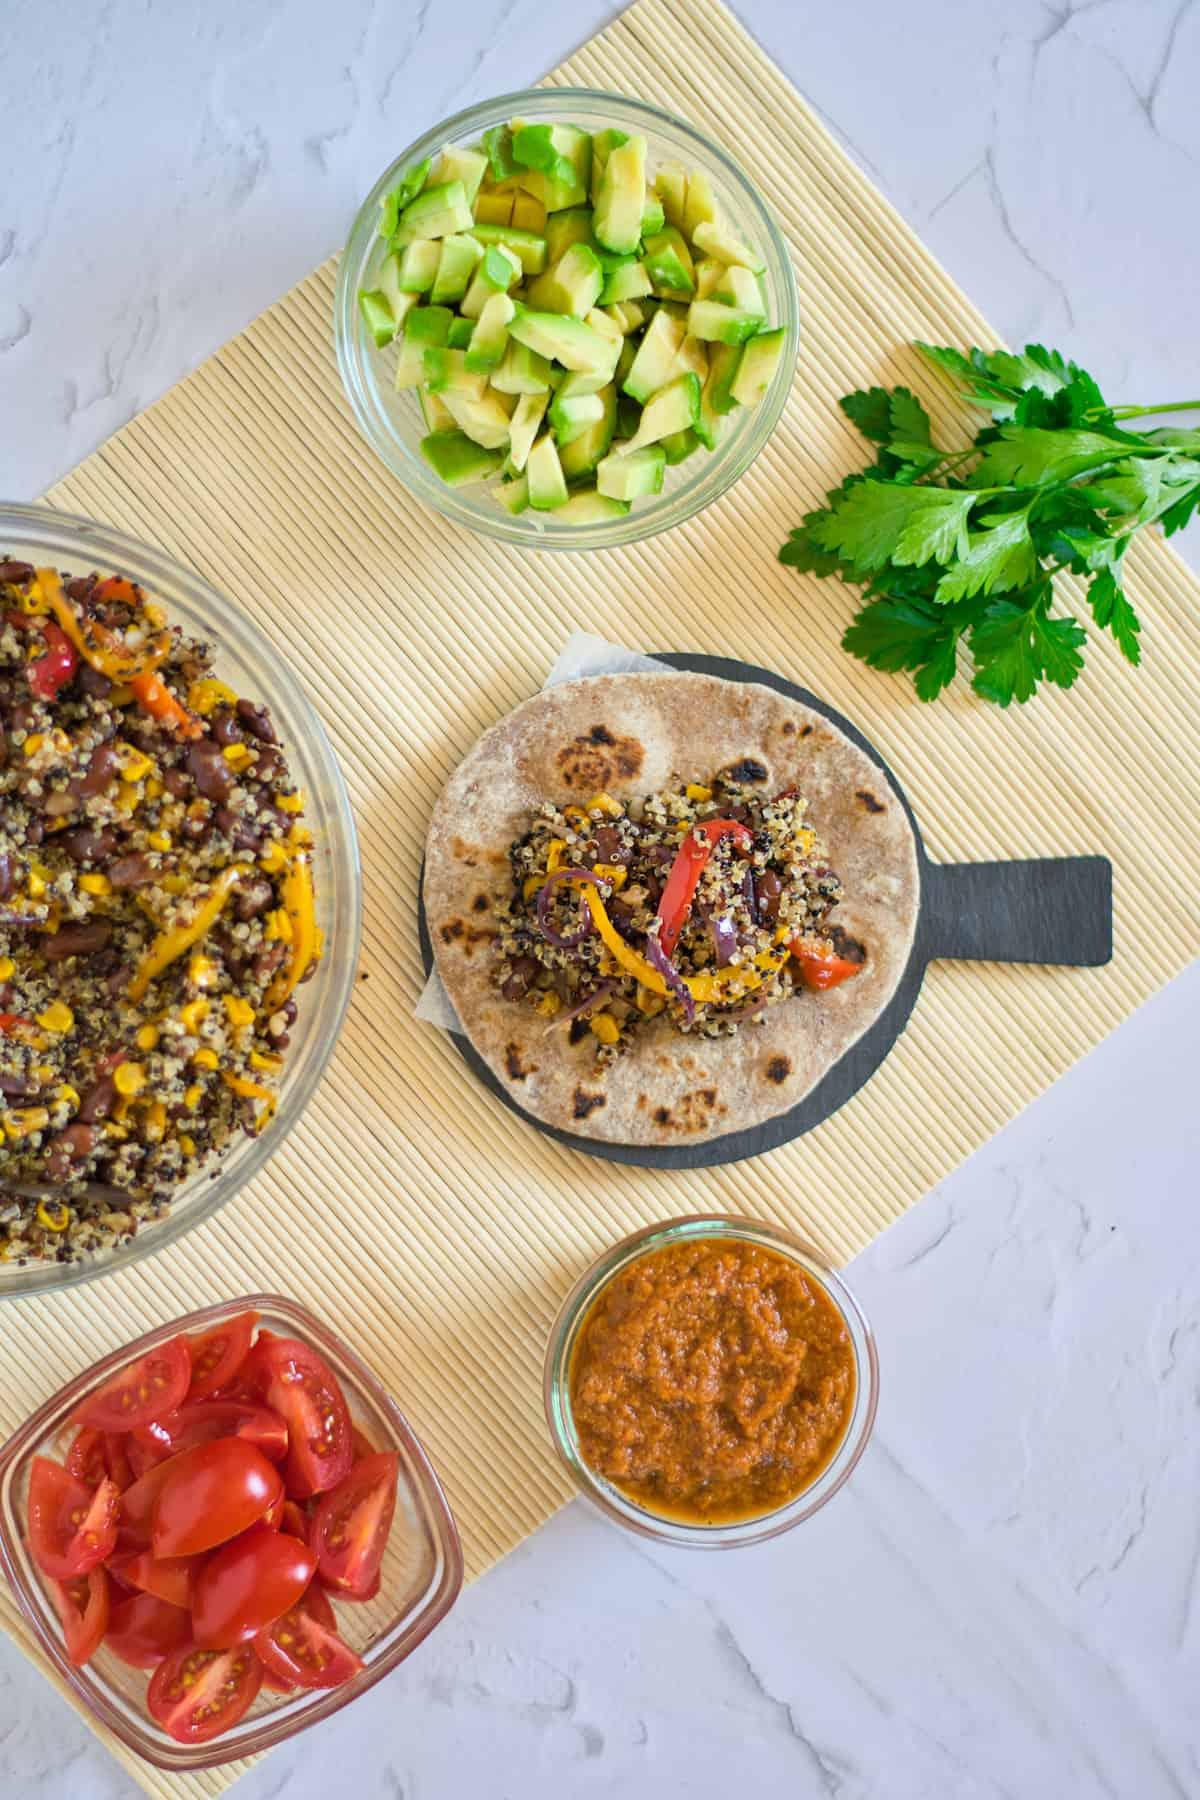 Avocado, tortilla mix. quinoa taco on mat with cilantro, salsa, tomatoes.